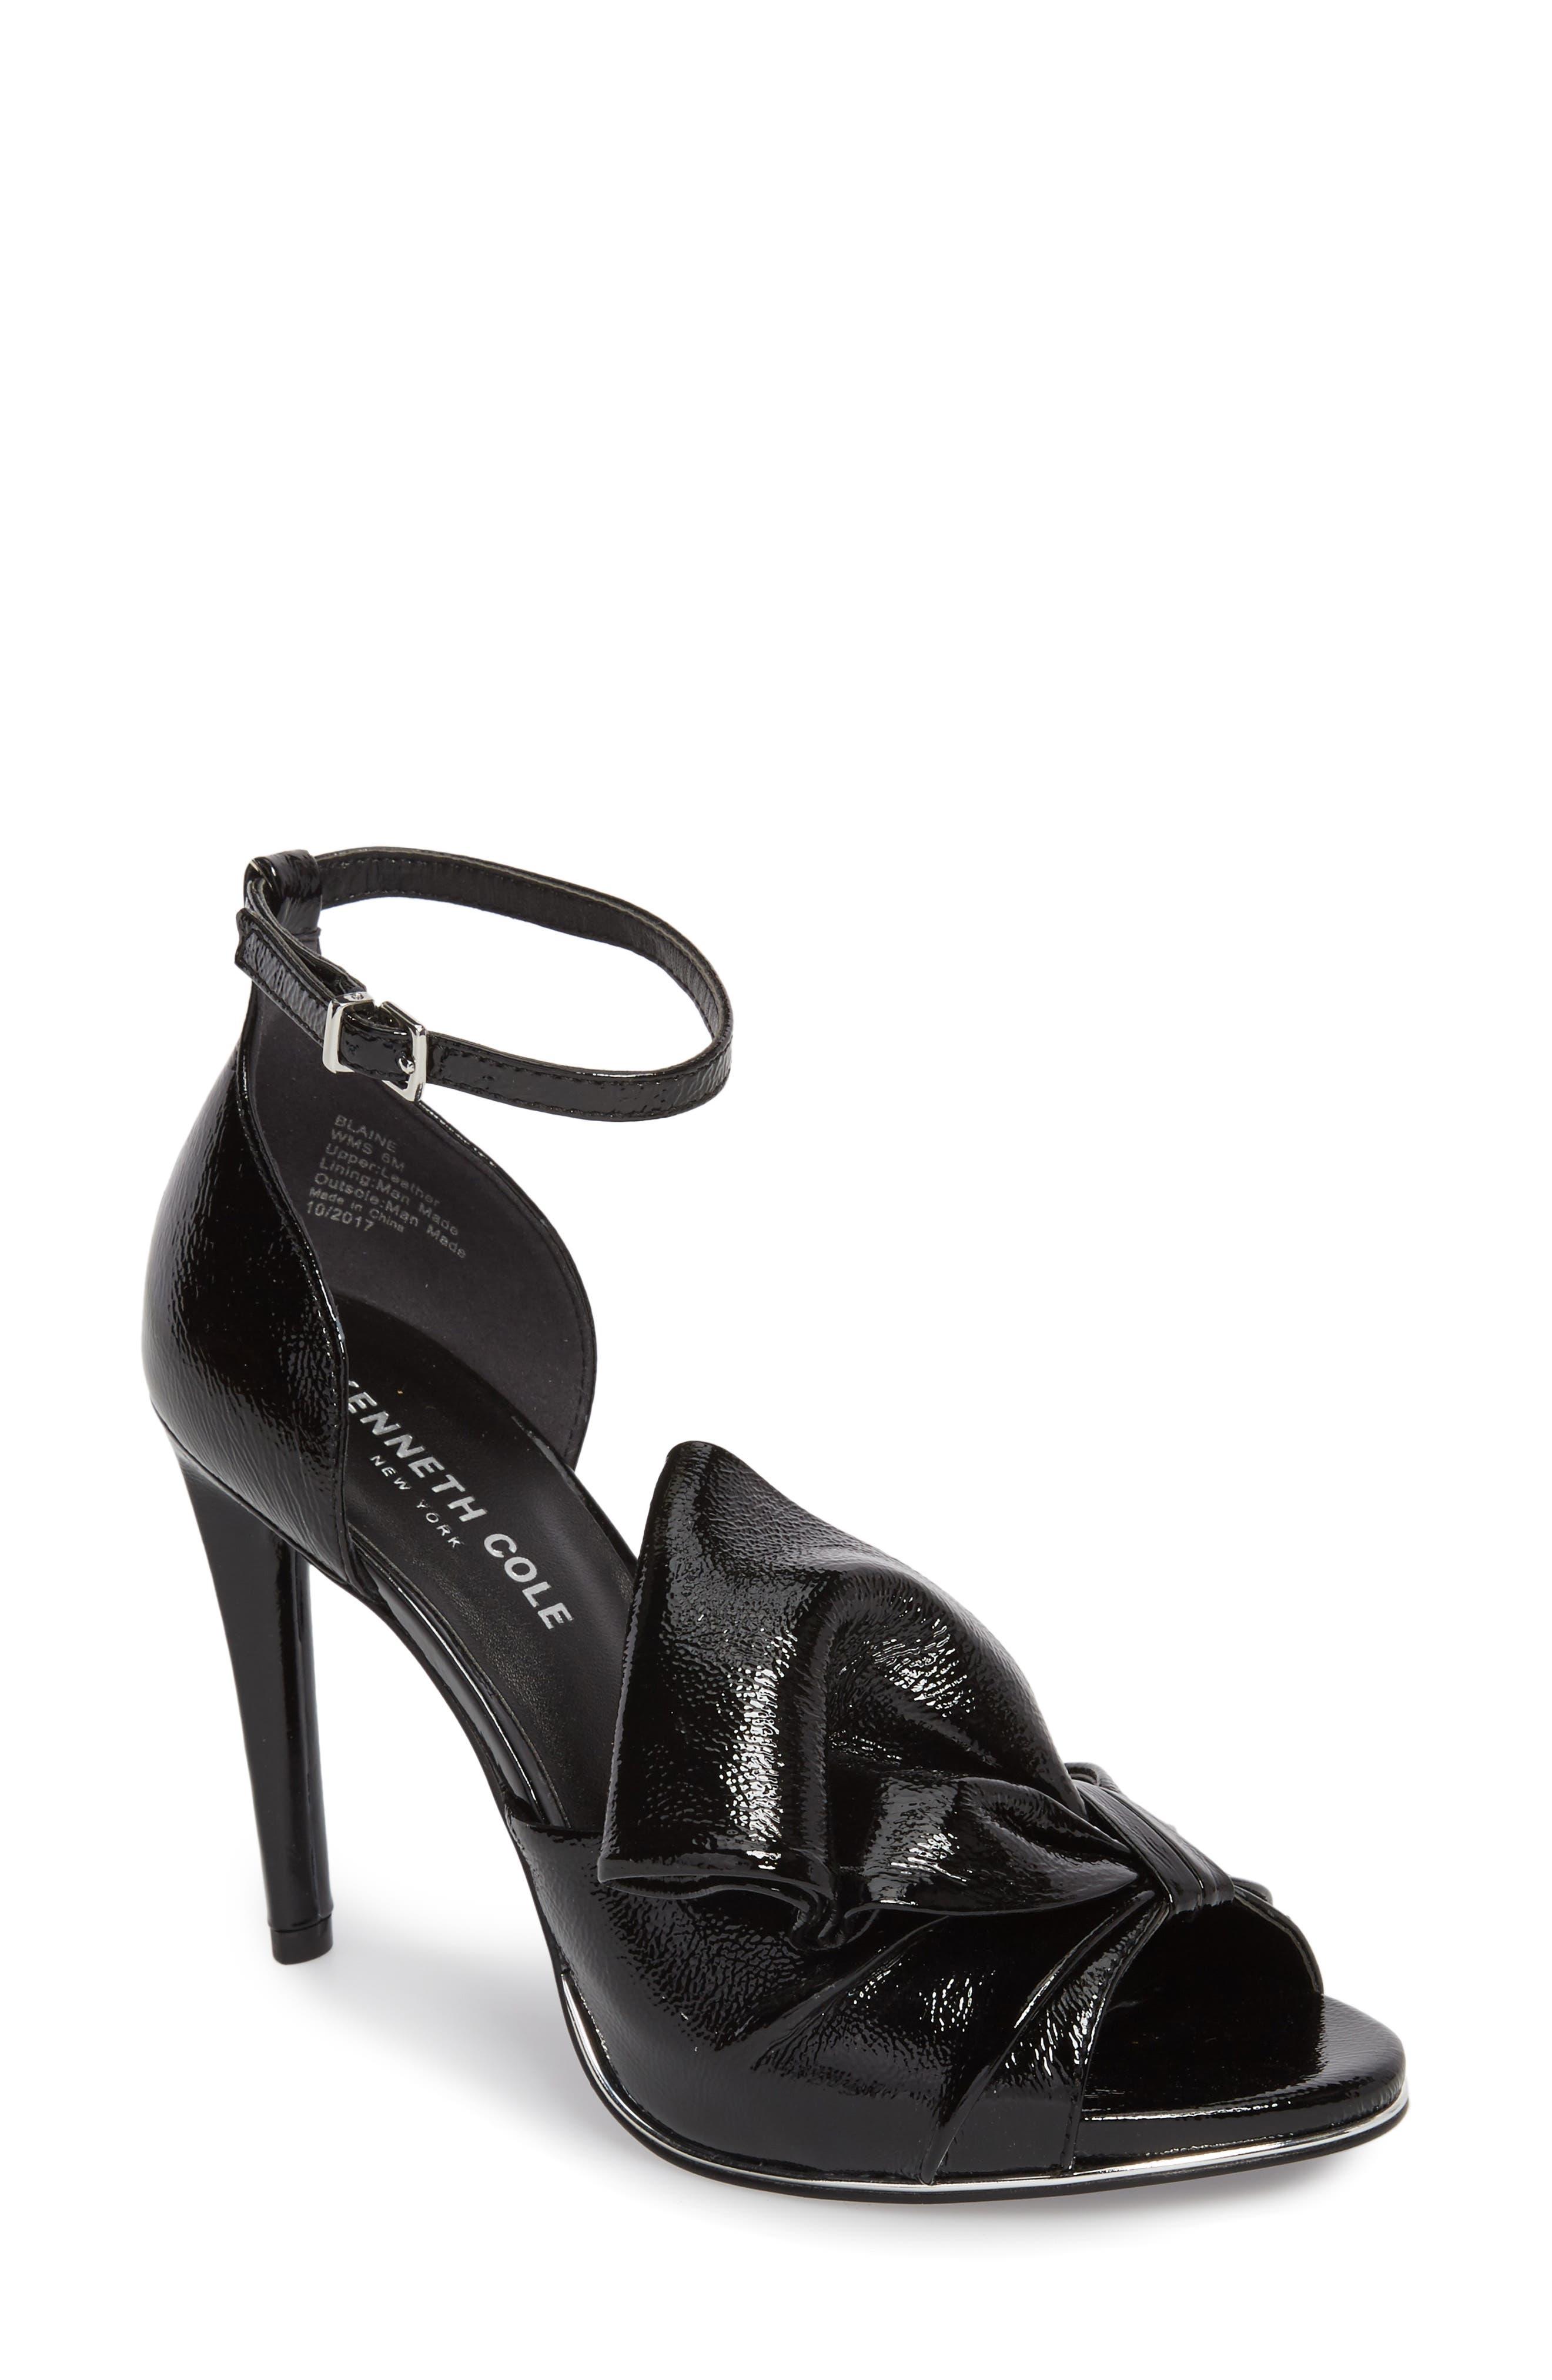 Main Image - Kenneth Cole New York Blaine Ankle Strap Sandal (Women)